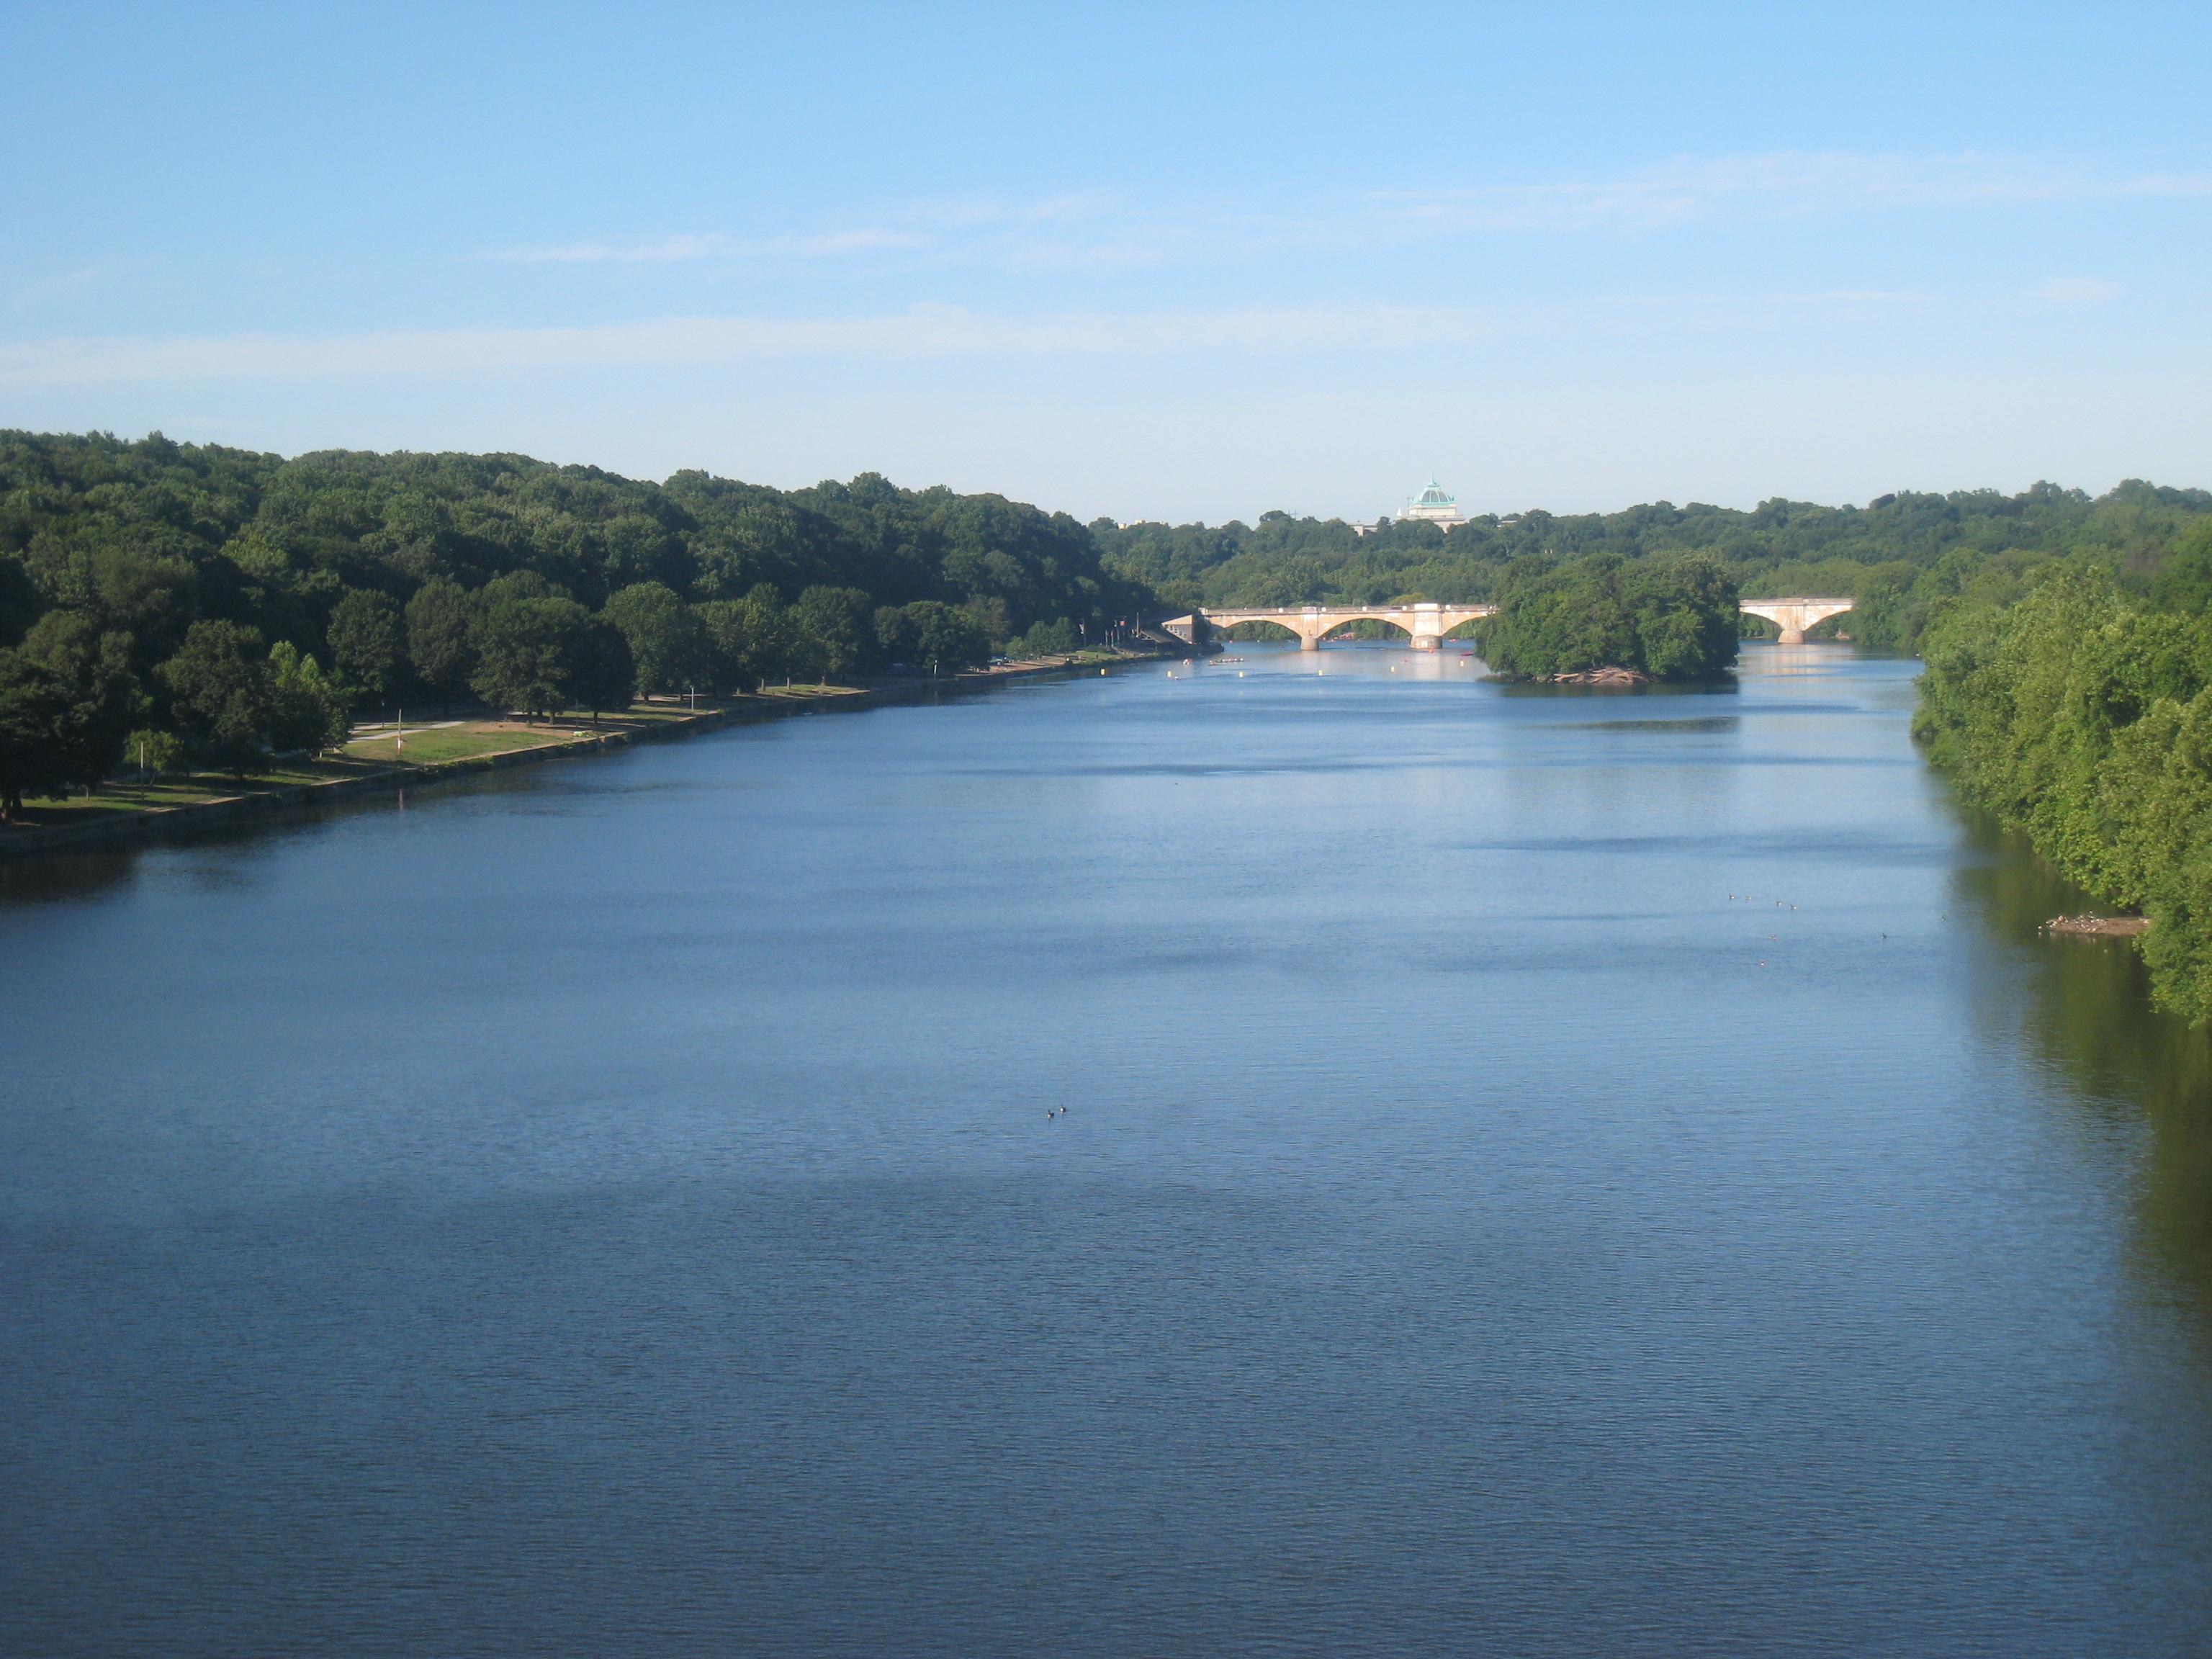 File:Schuylkill River in Fairmount Park..JPG - Wikimedia Commons